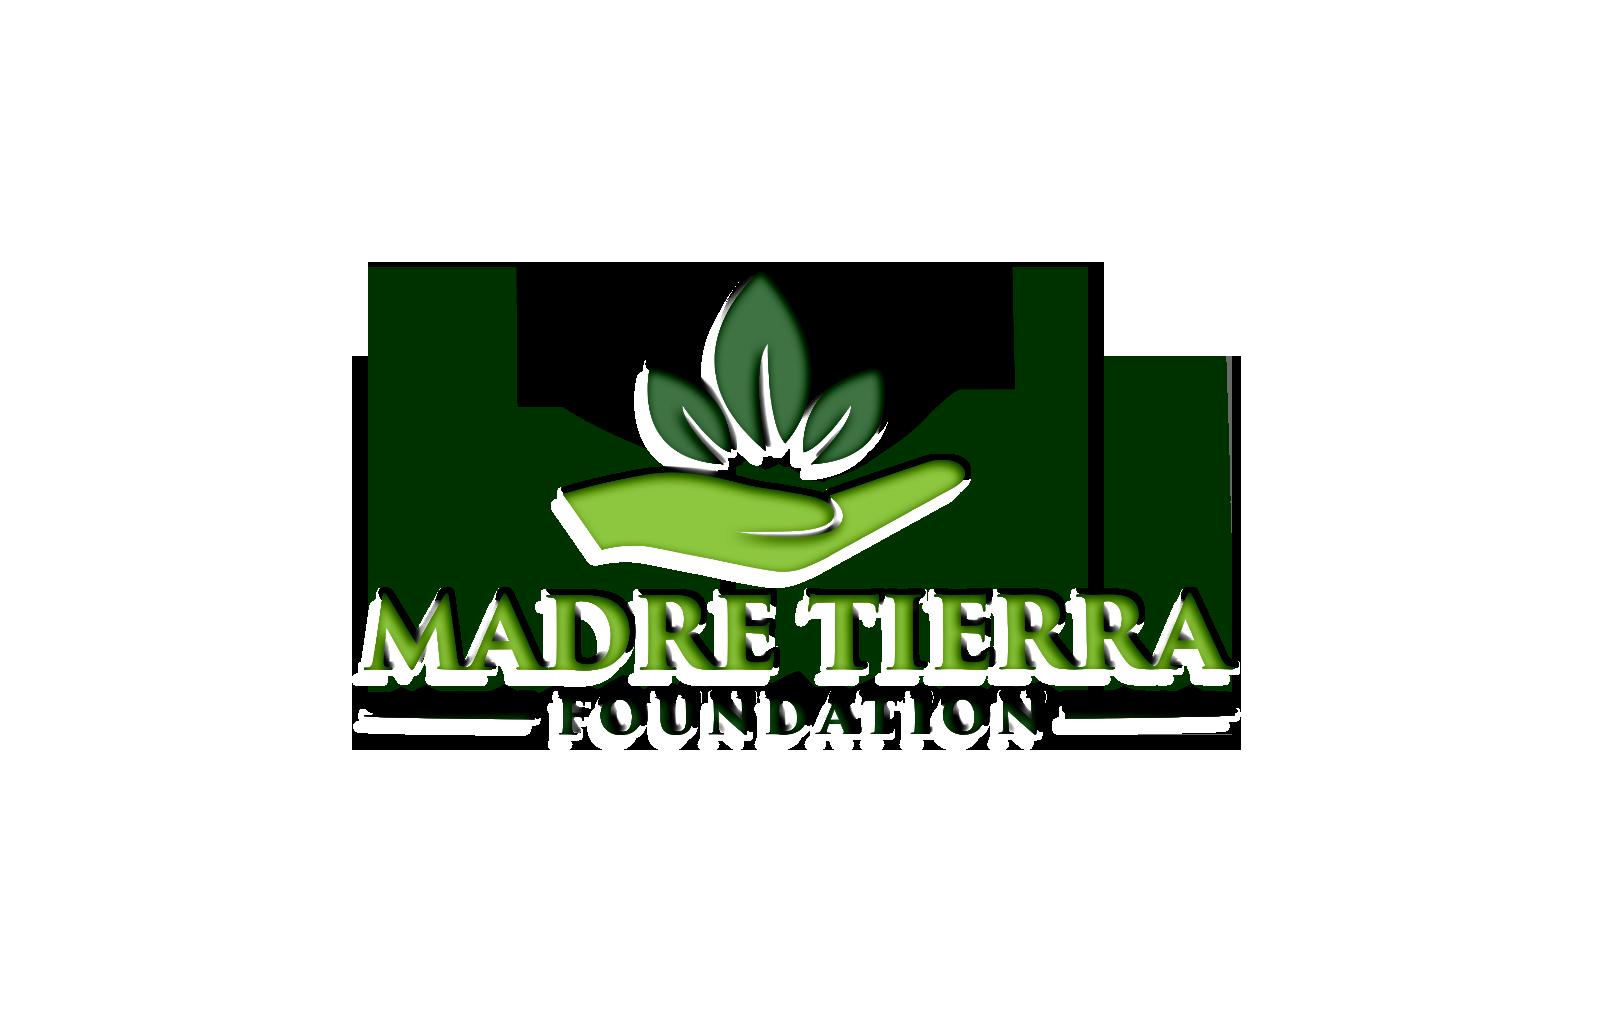 Madre Tierra Foundation